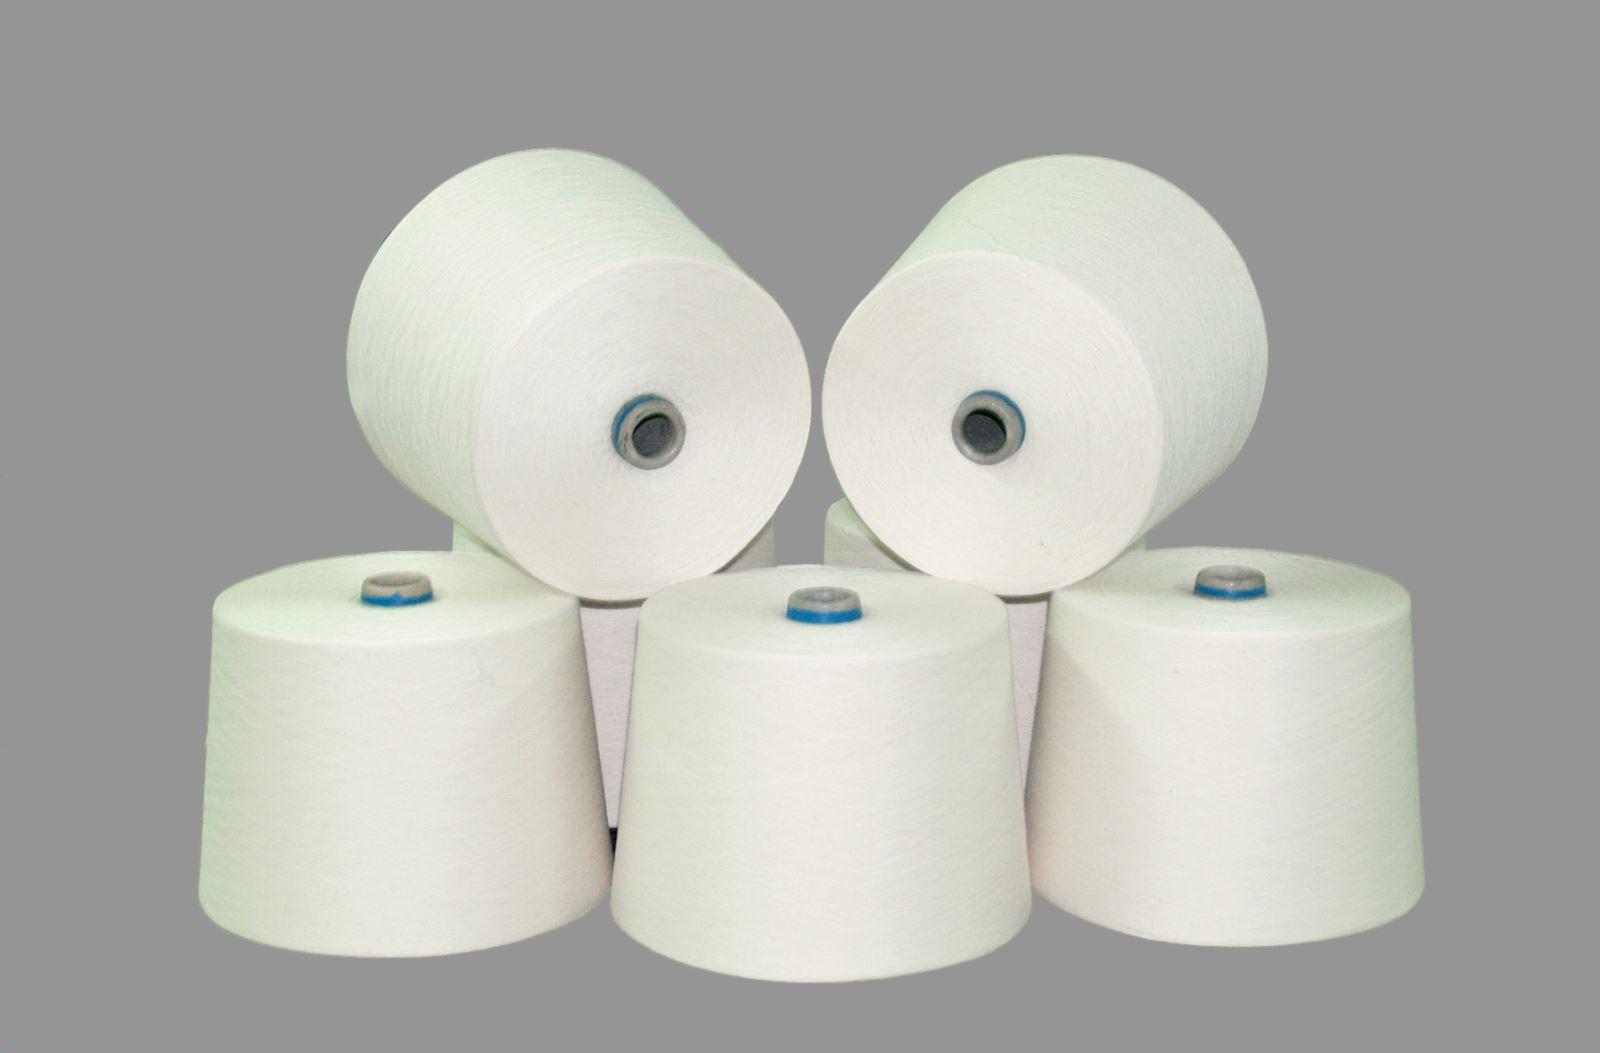 Sợi Cọc 100% Polyester